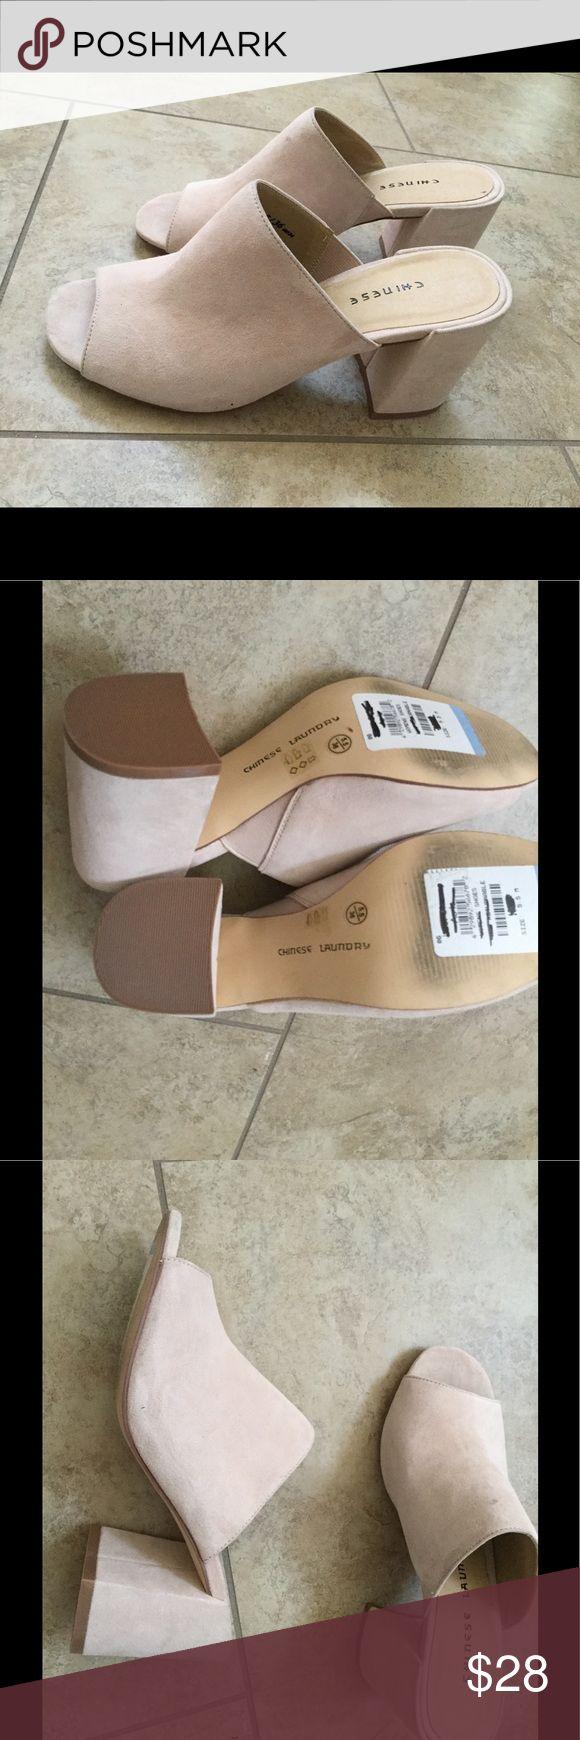 Chinese laundry shoe size 36 Chinese laundry shoe size 36 Chinese Laundry Shoes Sandals